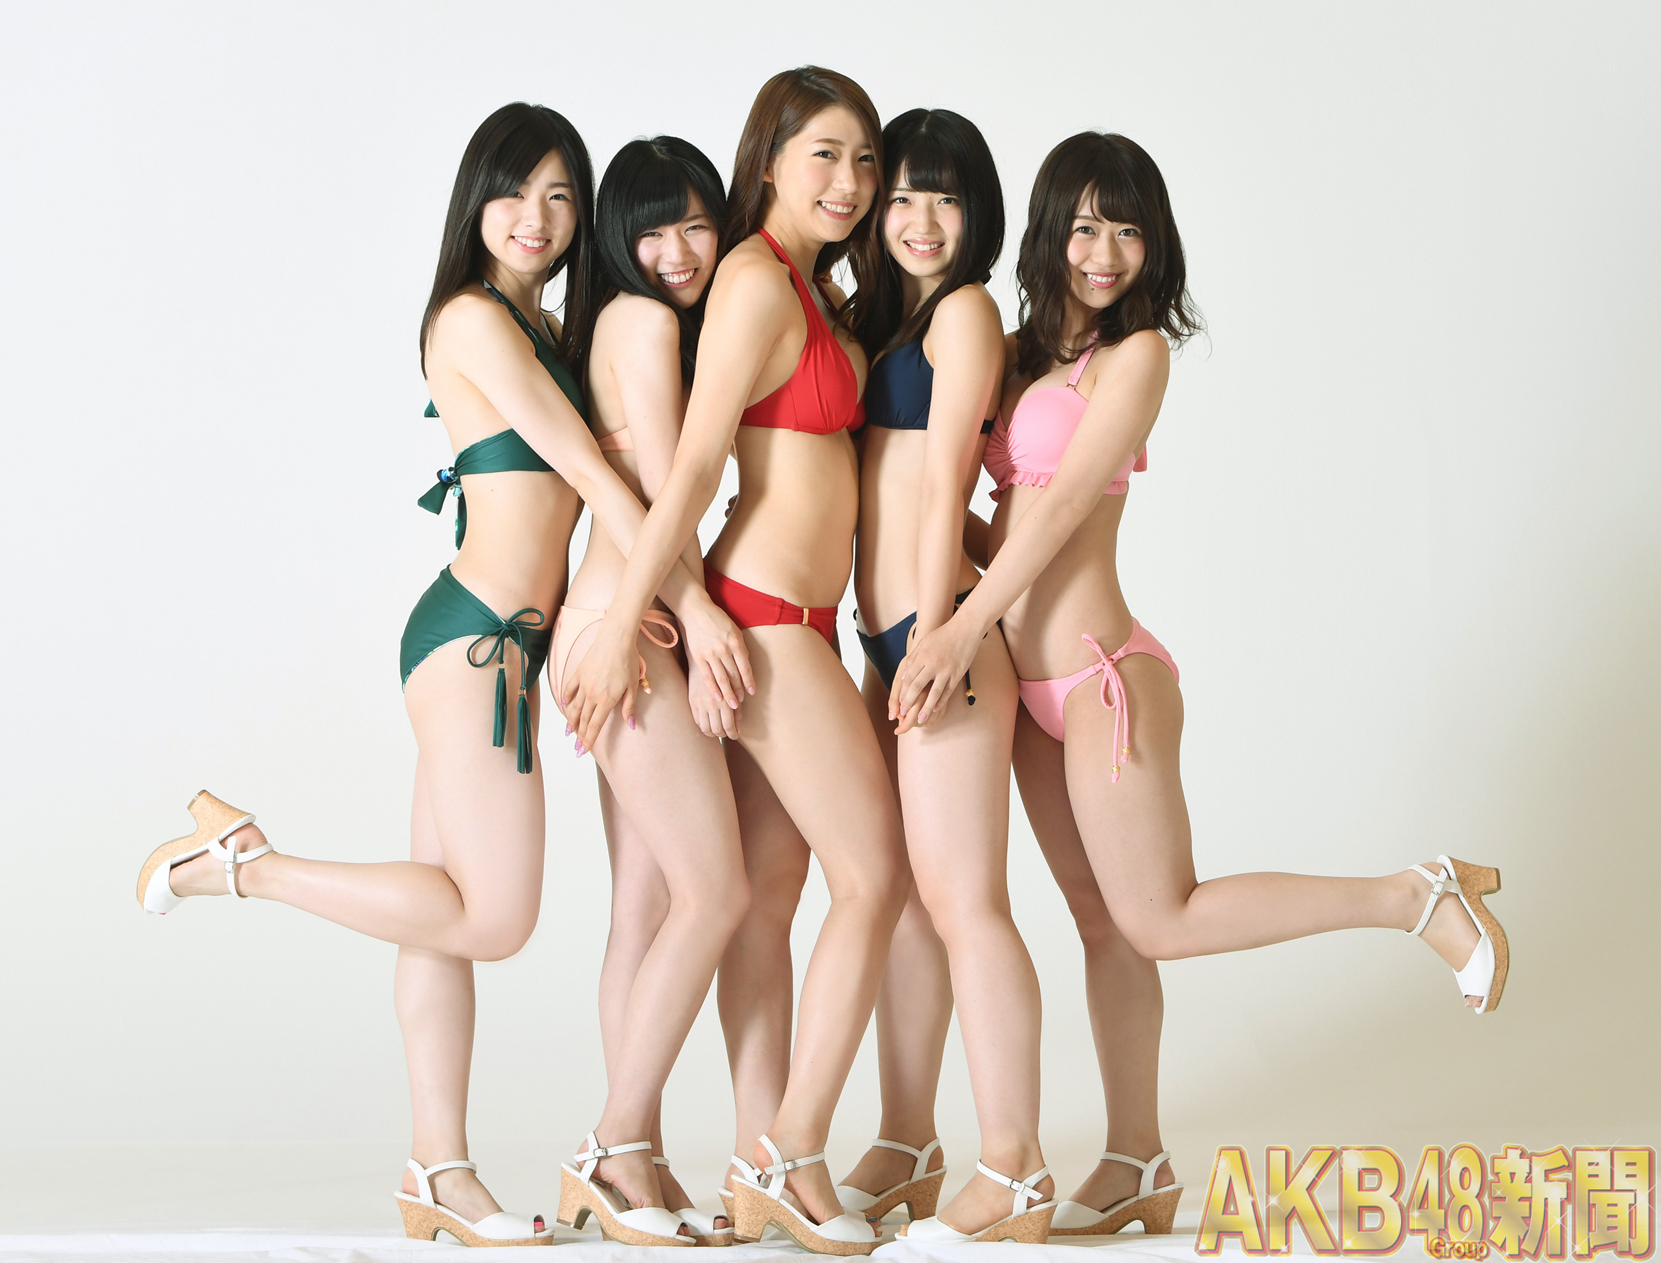 『AKB48ステージファイター2 バトルフェスティバル』でAKB48メンバーが共闘プレイ!新PVを公開